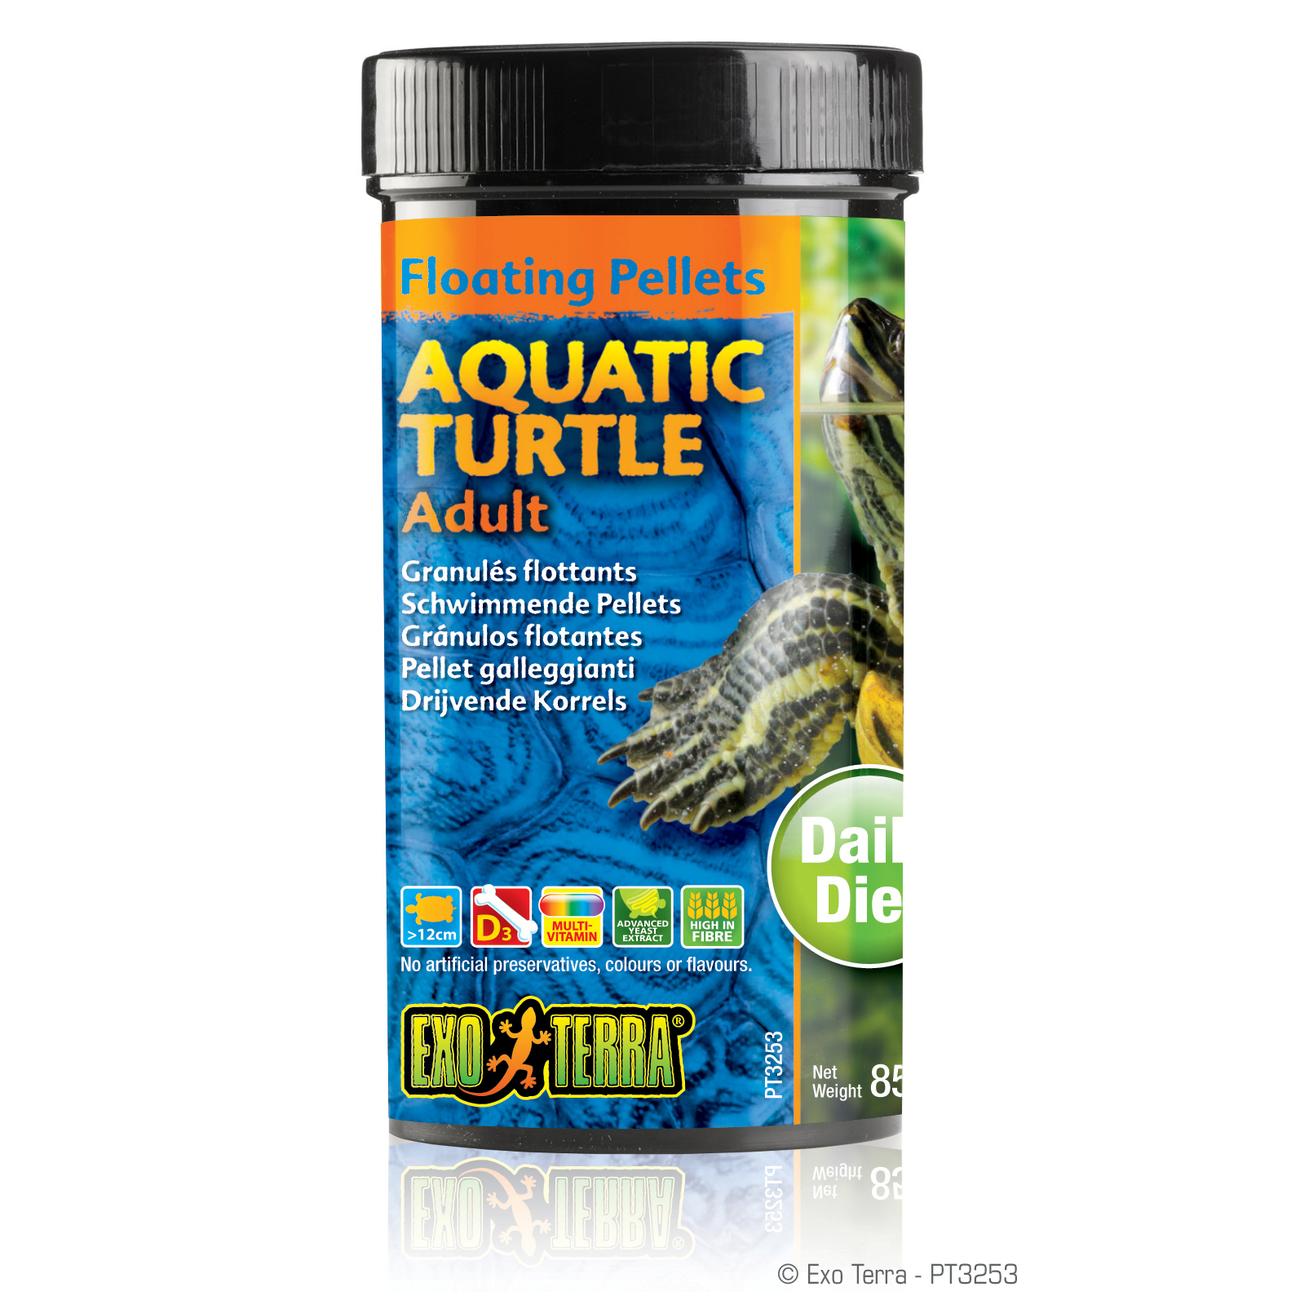 Exo Terra -  Aquatic Turtle Adult, schwimmende Futter-Pellets, Bild 2